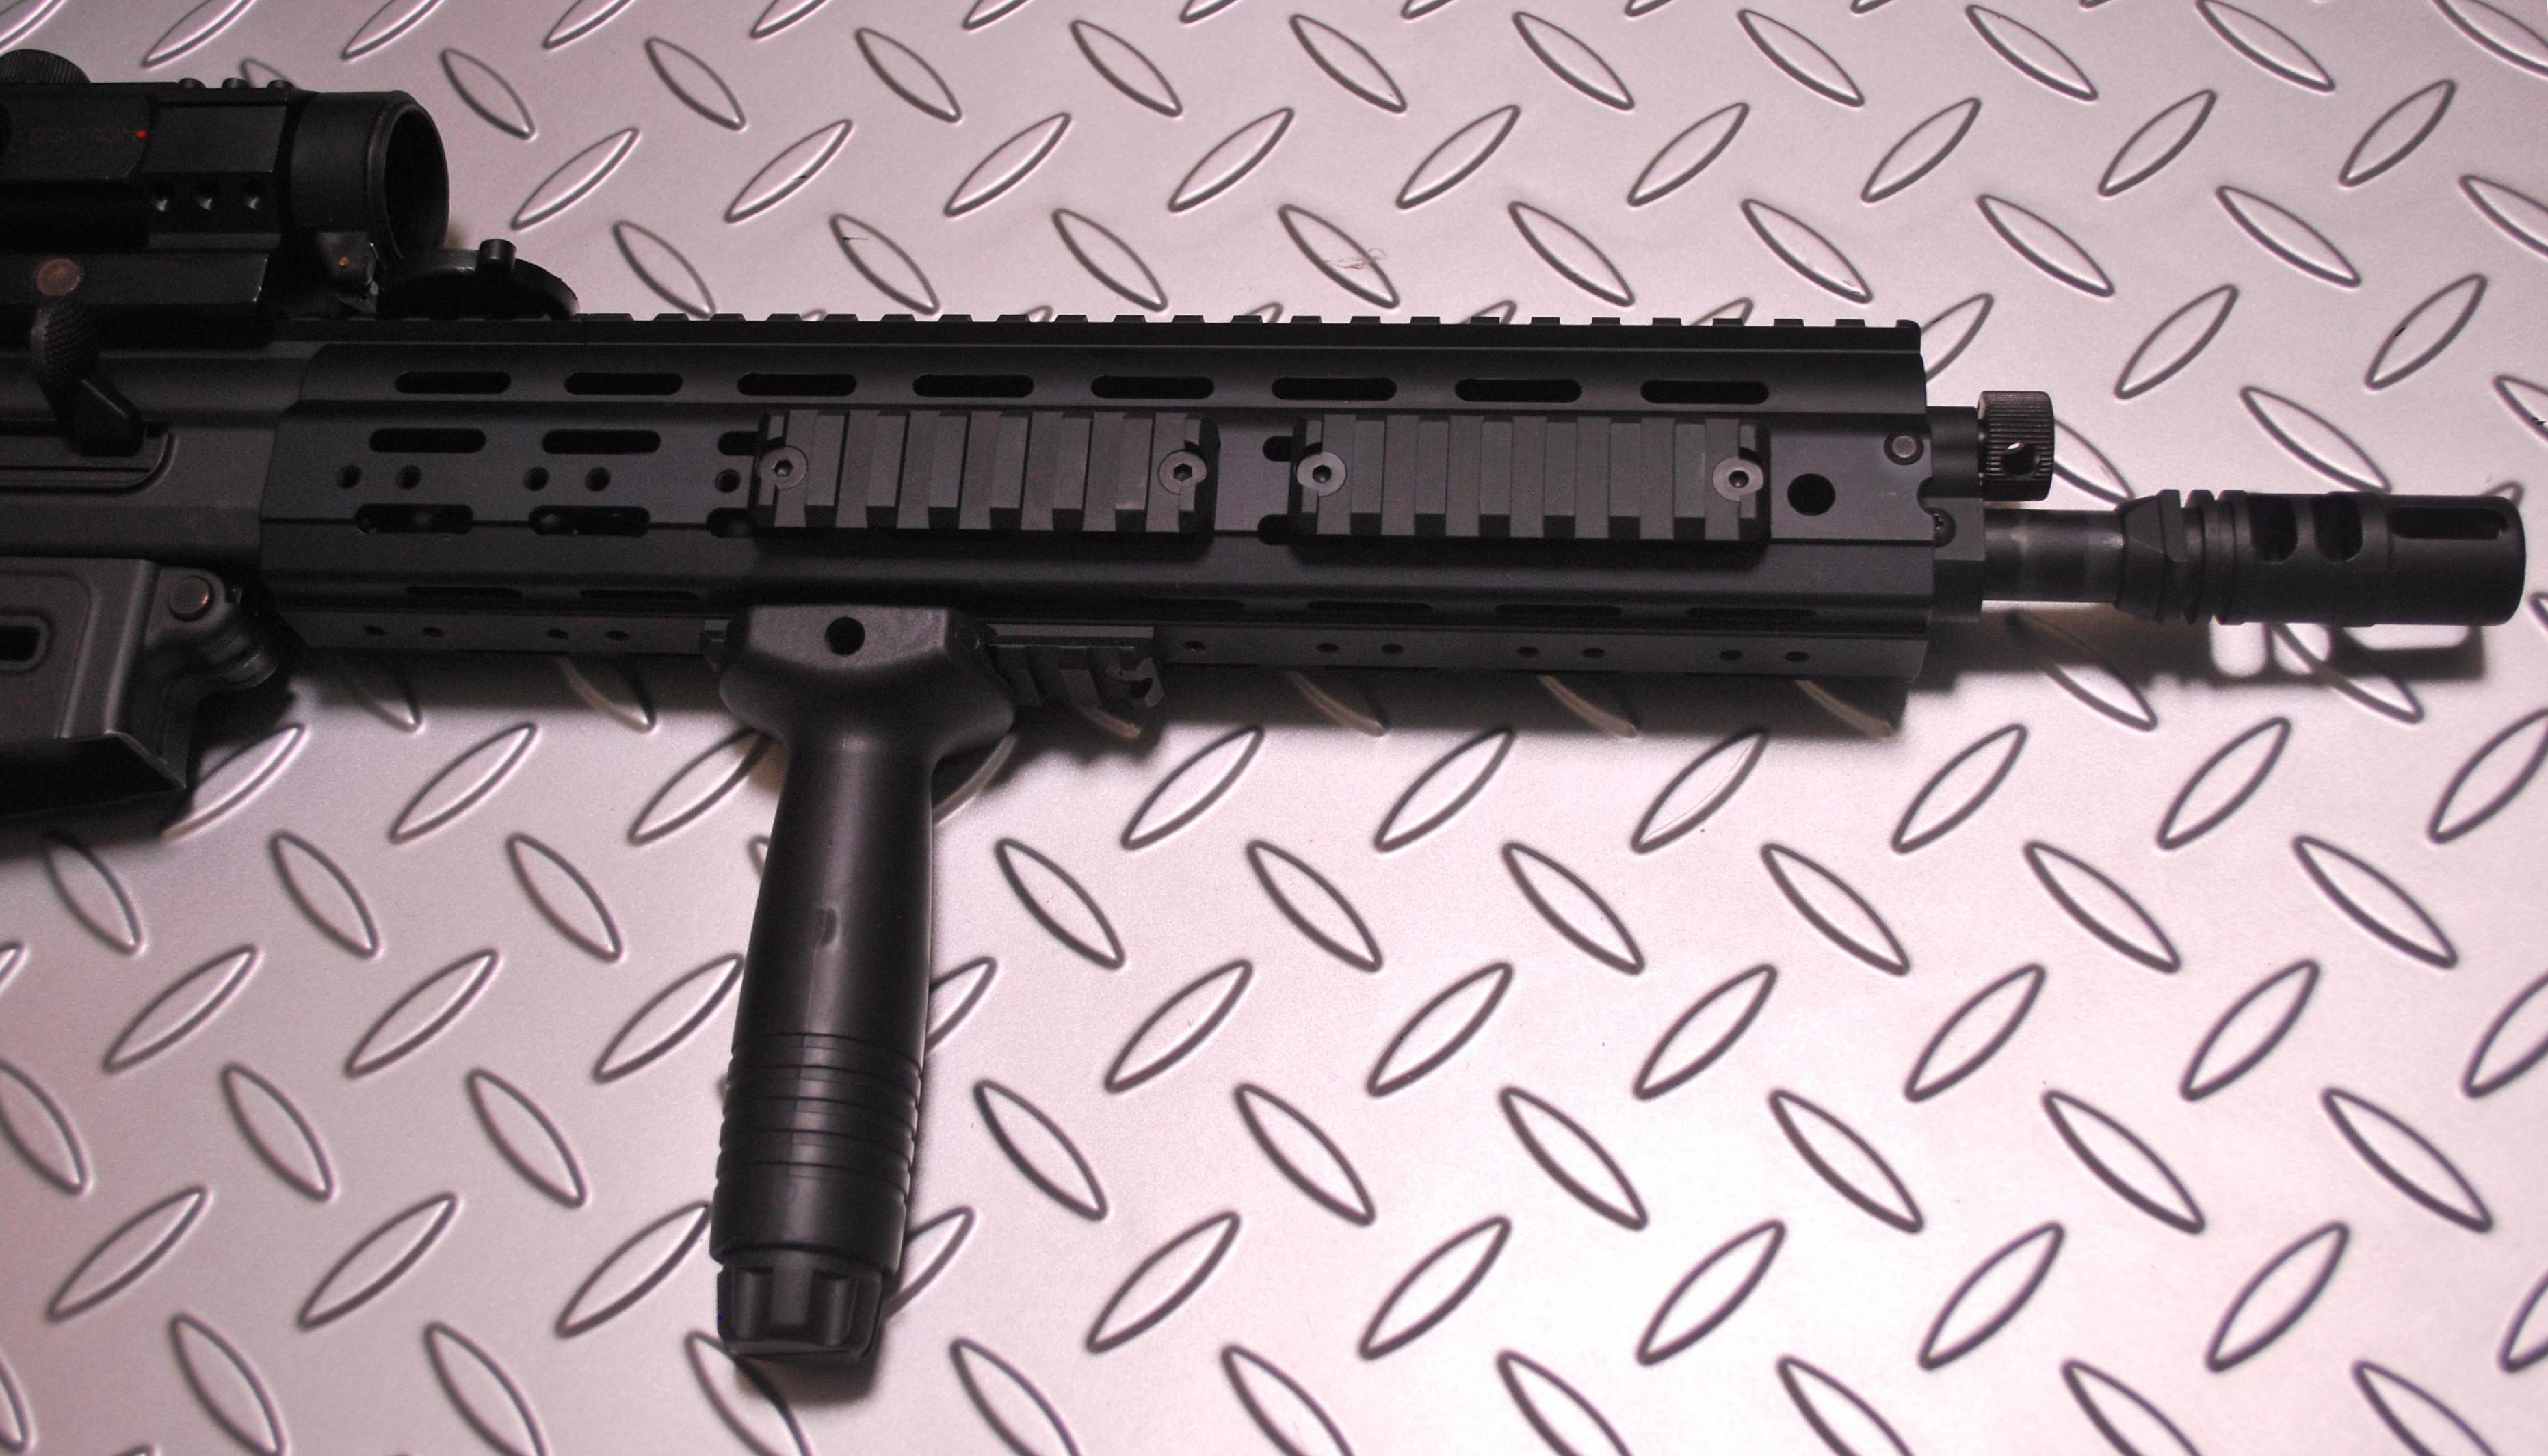 OTS 89式小銃用フラットレールシステム 89式用レールハンドガード電動用